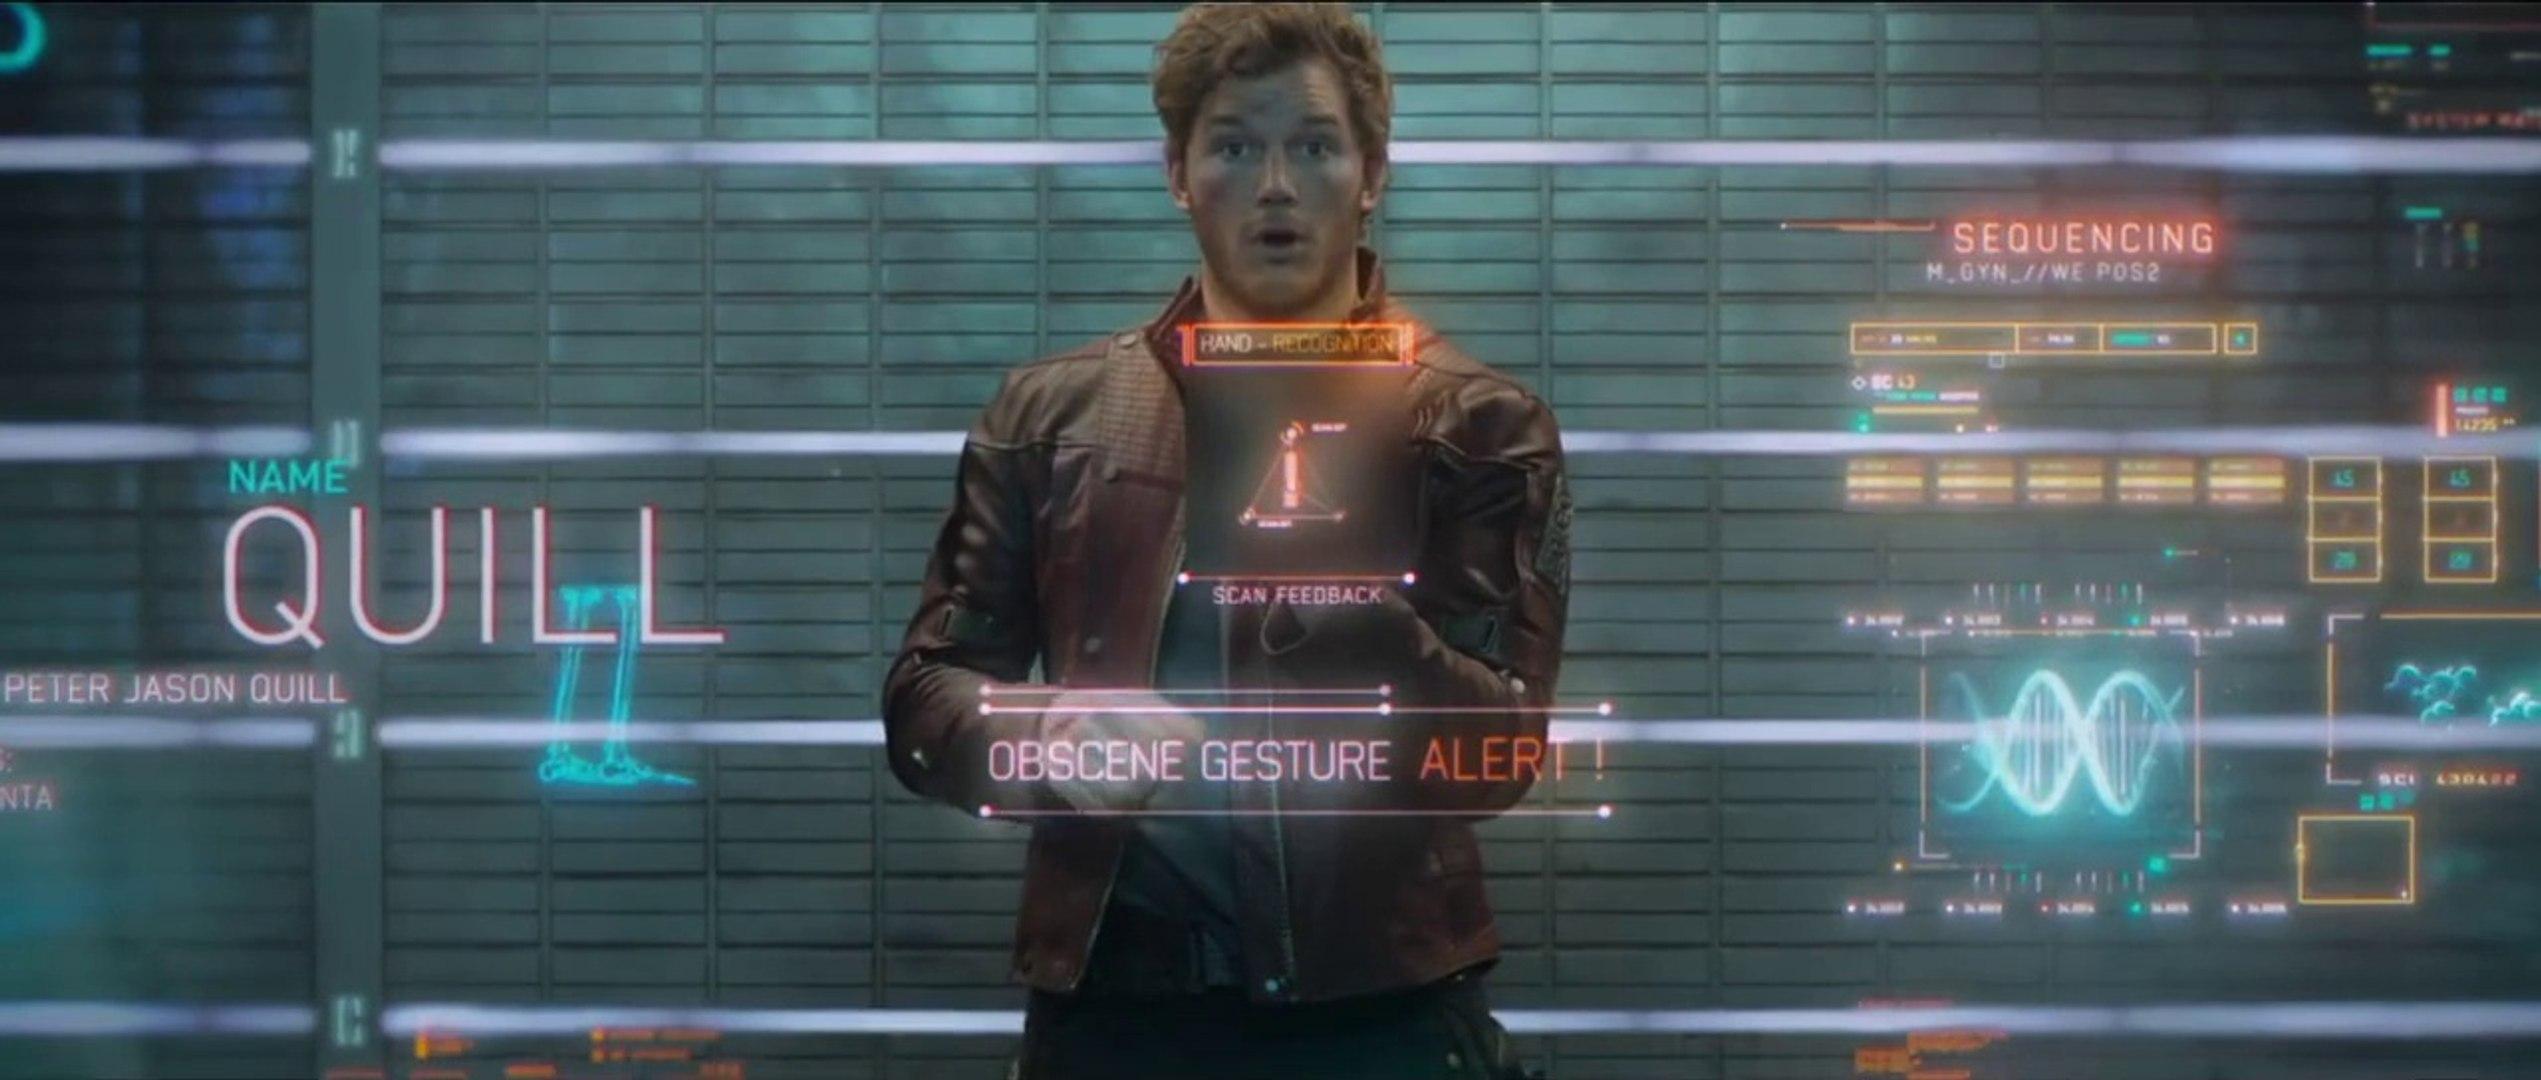 Les Gardiens de la Galaxie (2014) - Peter Quill a.k.a. Star-Lord [VOST-HD]